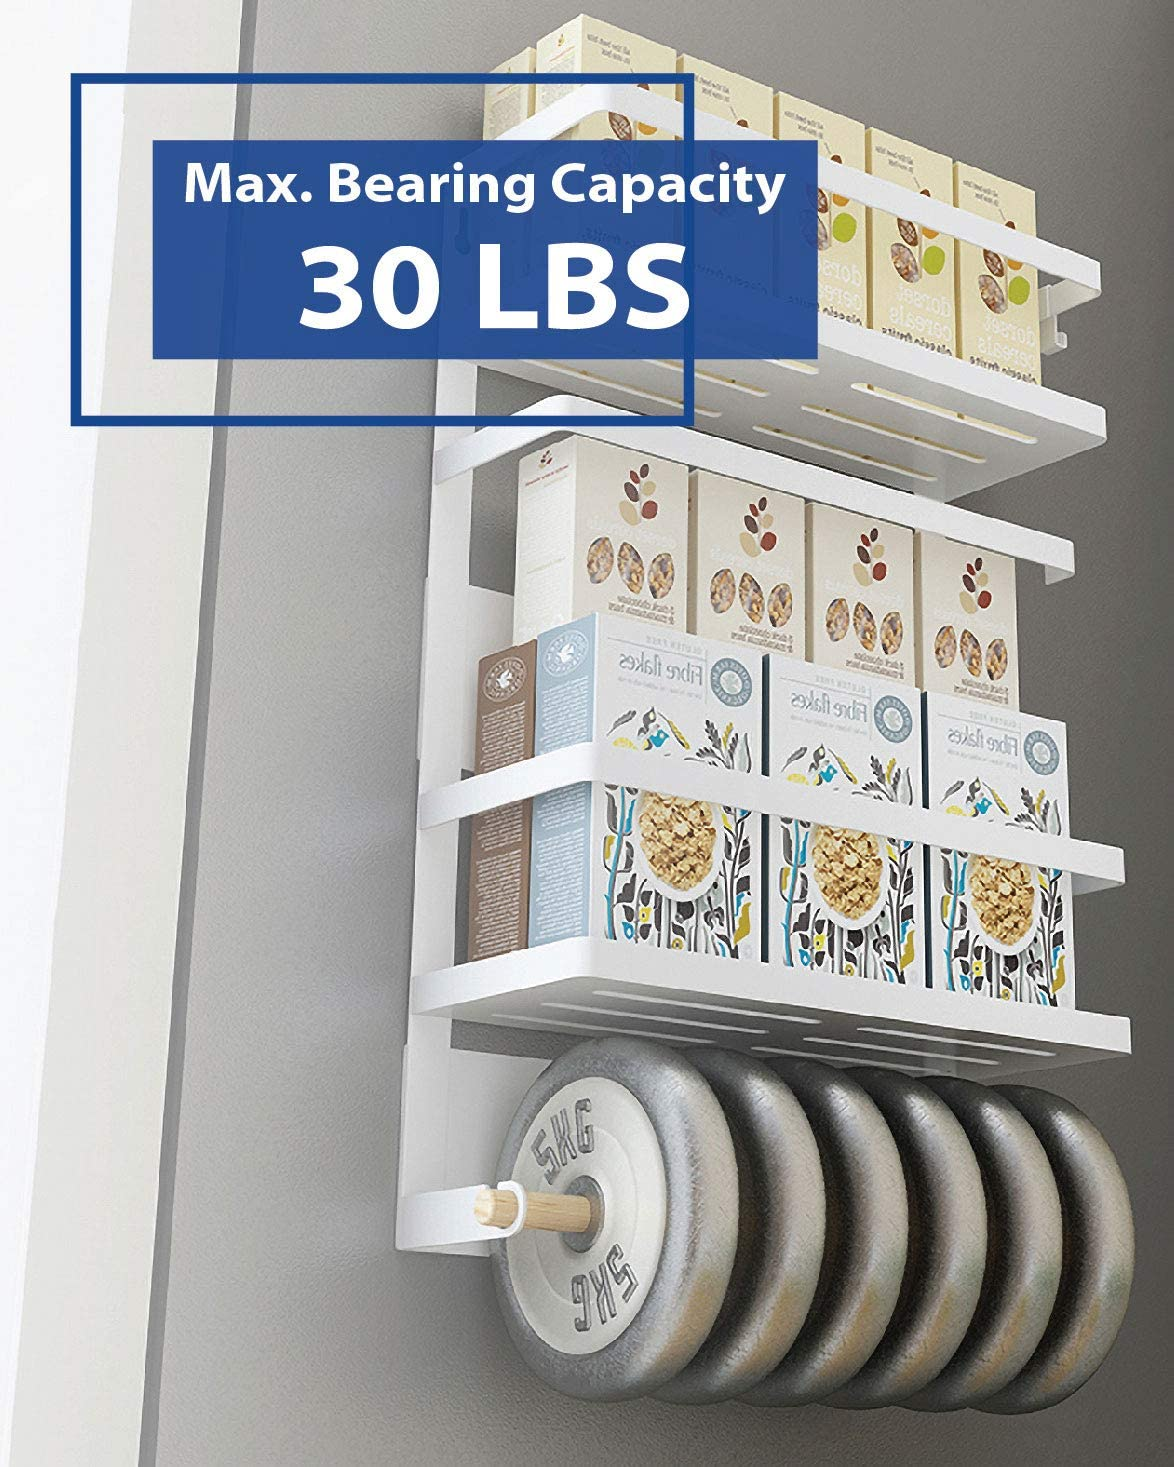 Matte Black Multi Use Kitchen Rack Shelves Winnprime Magnetic Fridge Spice Rack Organizer with 5 Utility Hooks 4 Tier Magnetic Paper Towel Holder